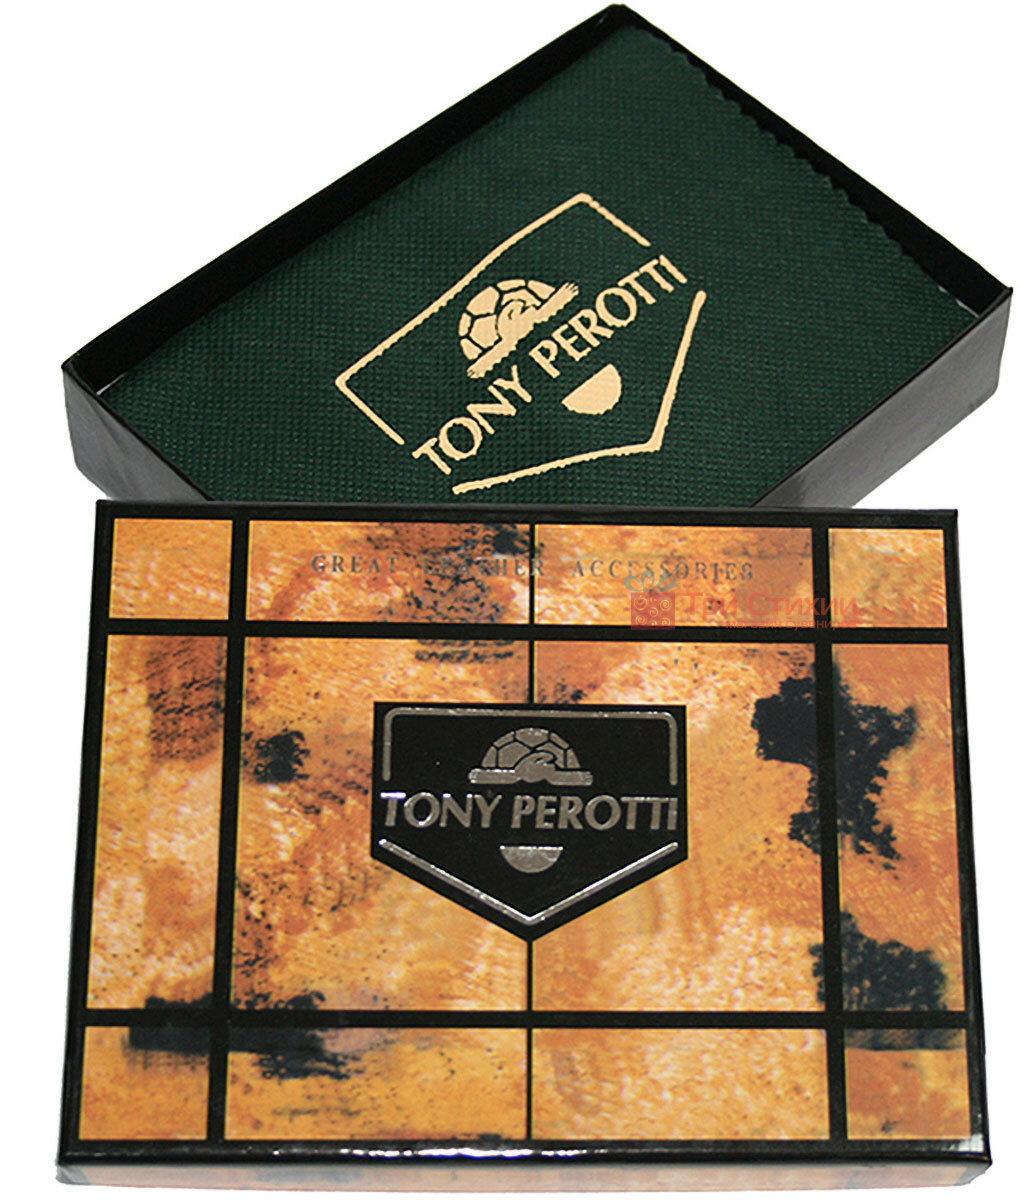 Ключница Tony Perotti Italico 359-it cognac Коньяк, Цвет: Коньяк, фото 4